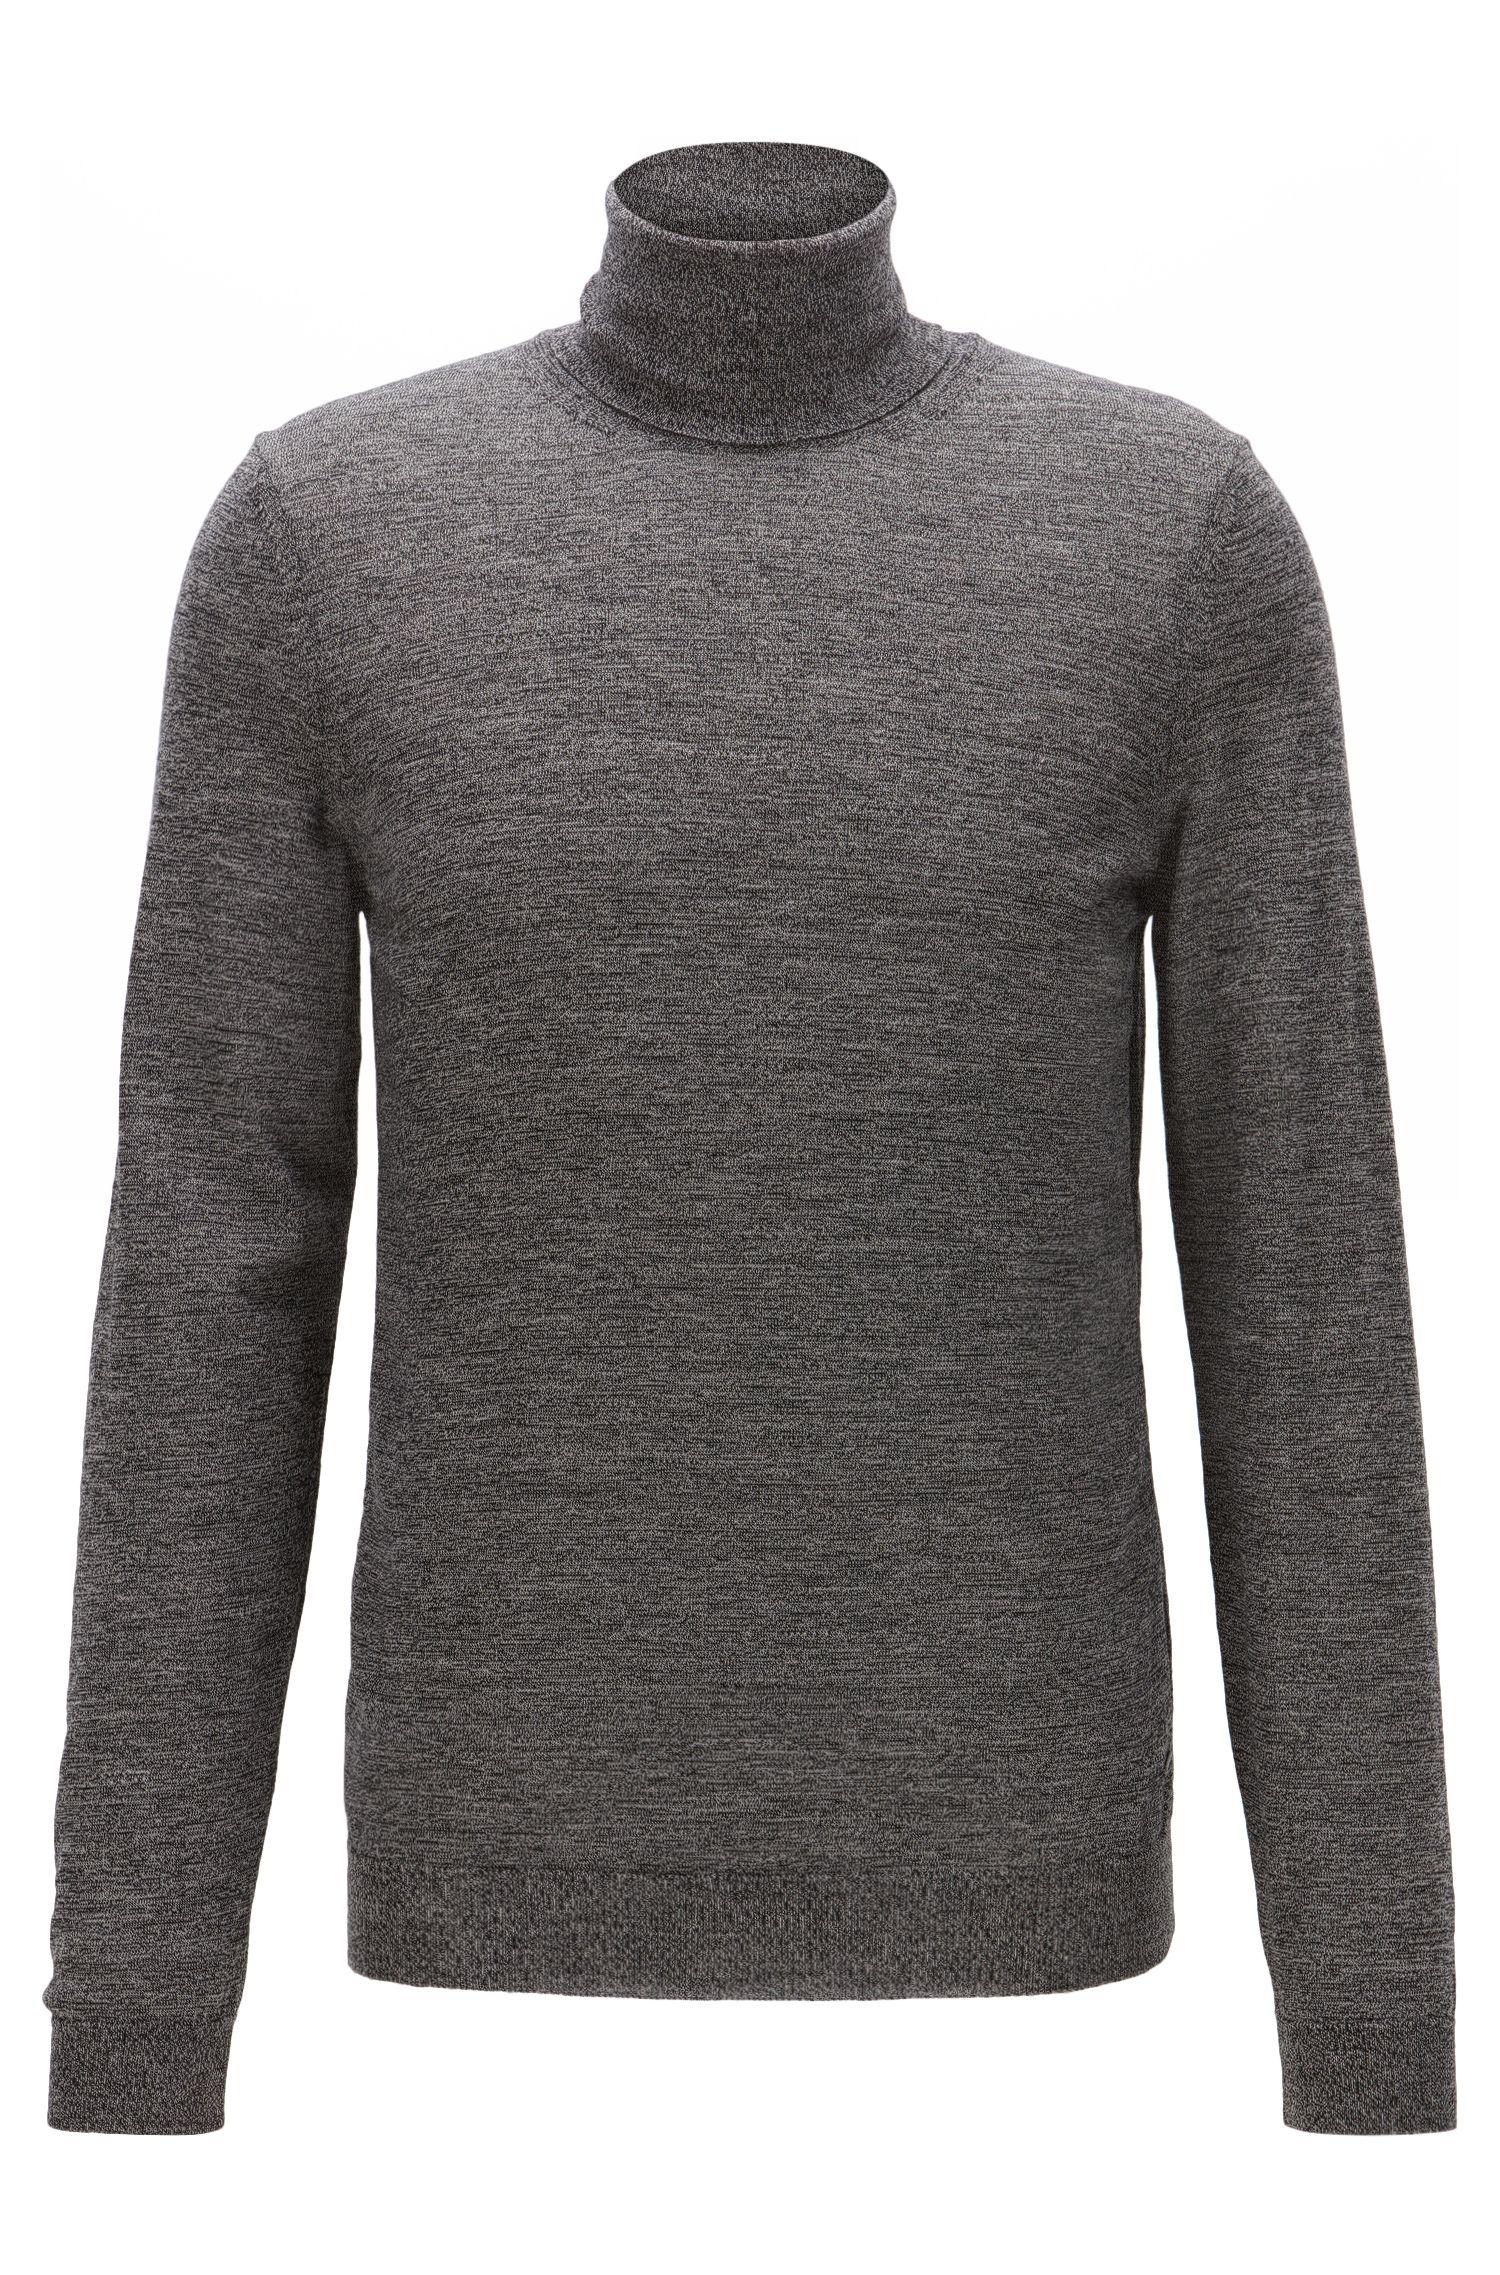 Merino Wool Turtleneck Sweater | Musso N